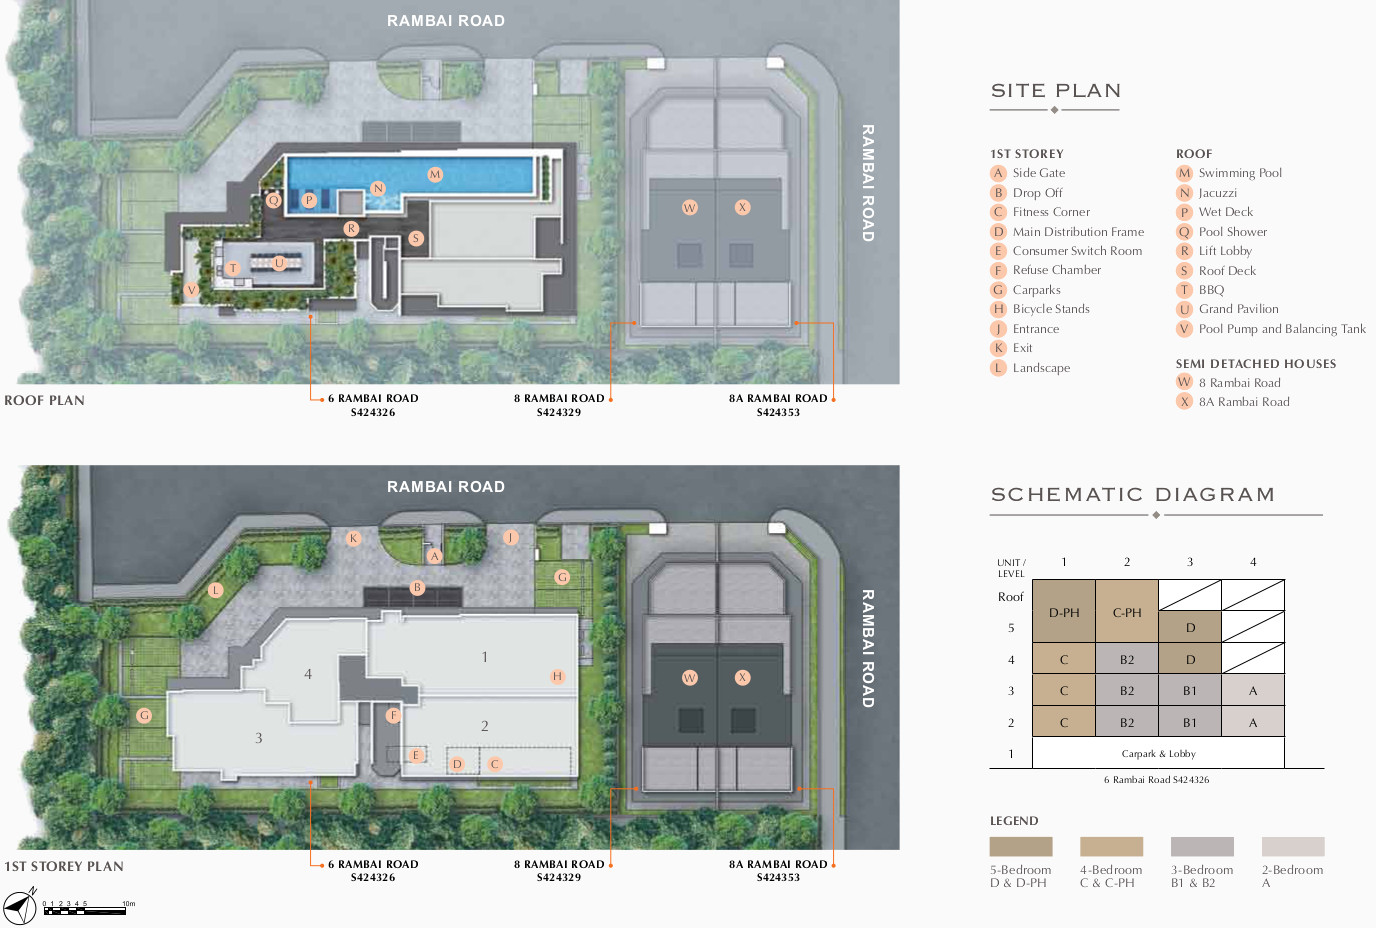 The Ramford Site Plan